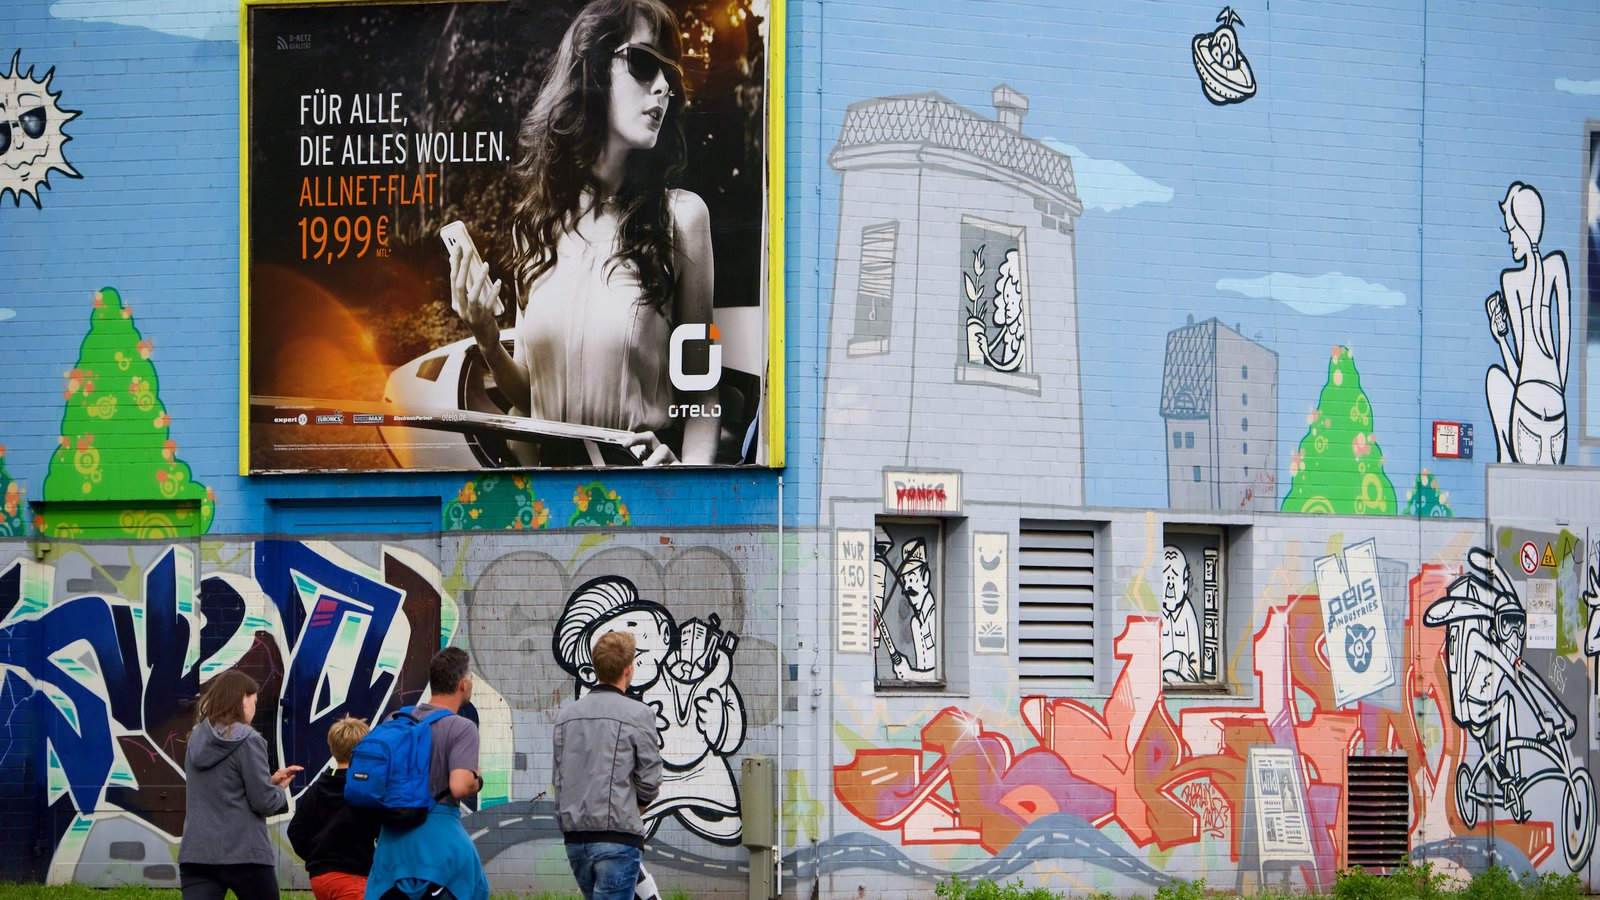 Friedrichshain featuring outdoor art as well as a family